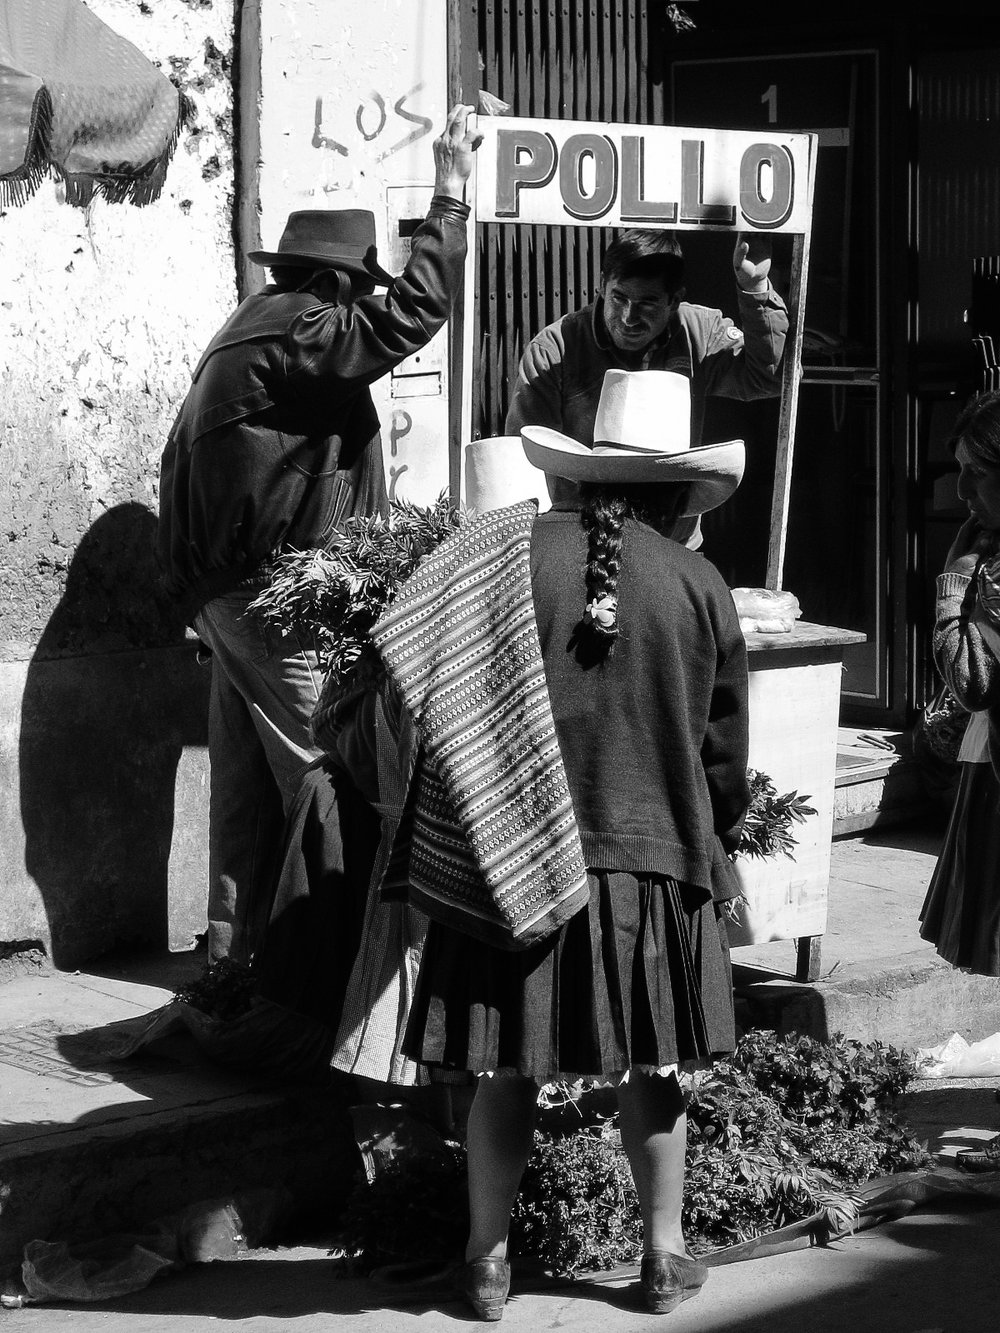 cajamarca_town-6028-_peruvian-woman-at-pollo-stand.jpg